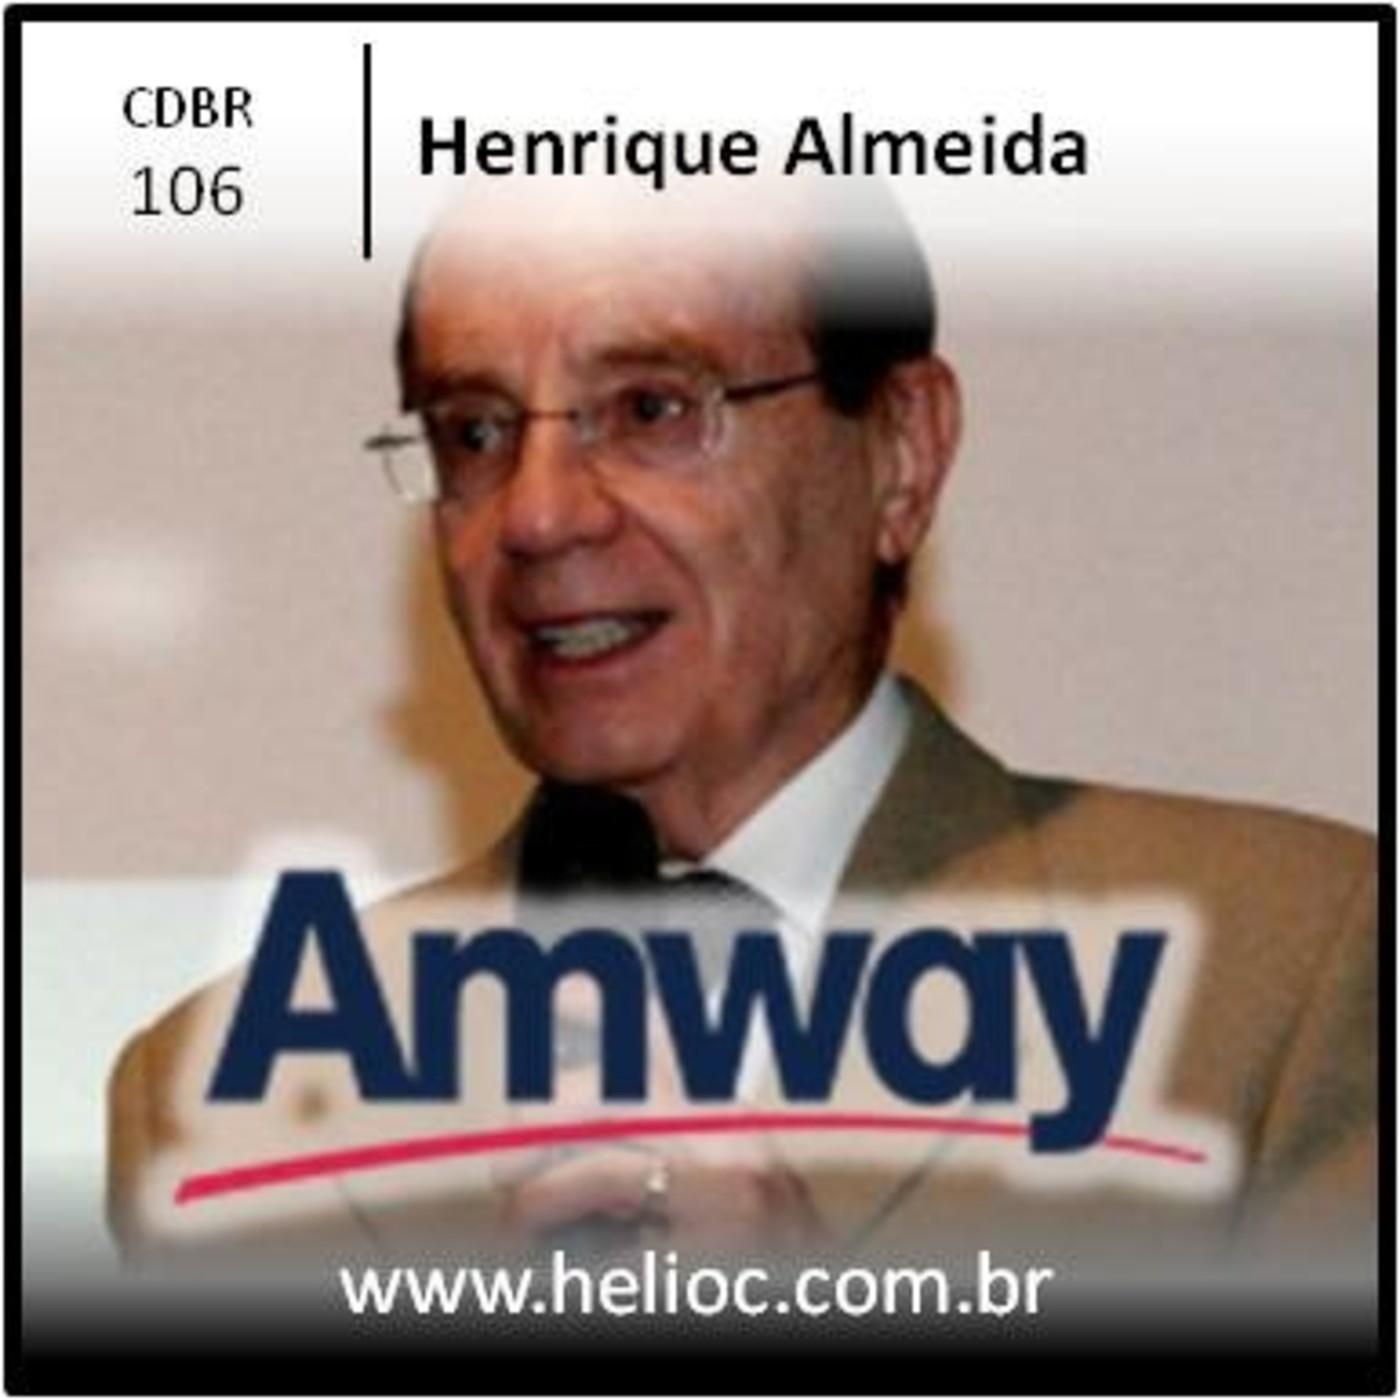 CDBR 106 - E Facil Mostrar o Plano - Henrique Almeida